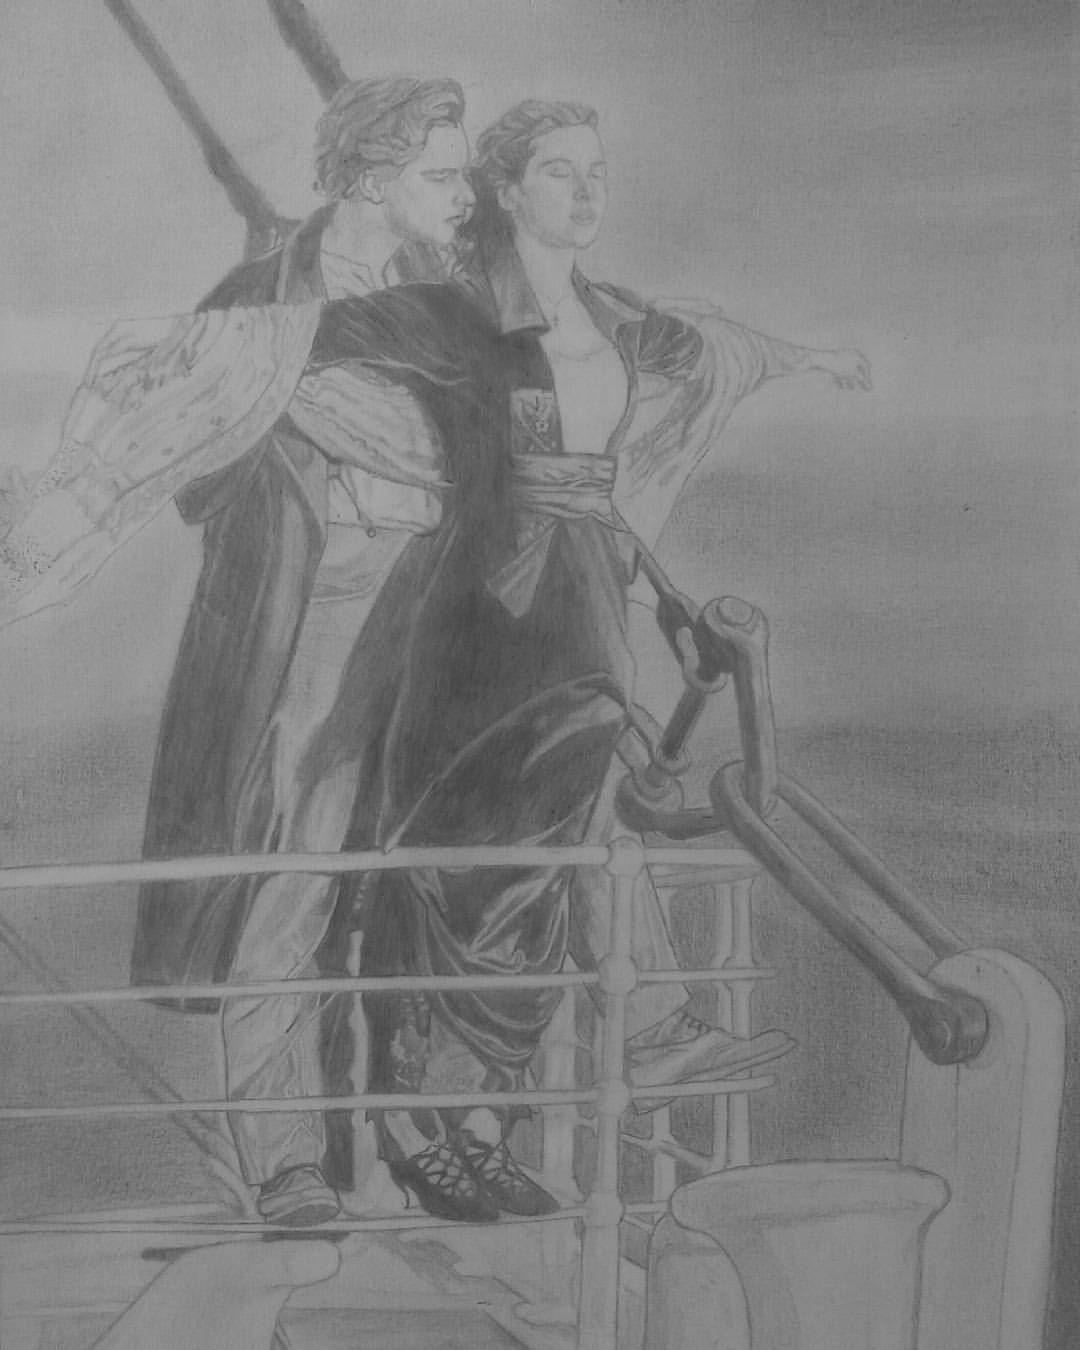 Jack Rose Titanic Lapiz Dibujos Comprar Arte Original Titanic Dibujo Arte De Silueta Luz Y Sombra Dibujo